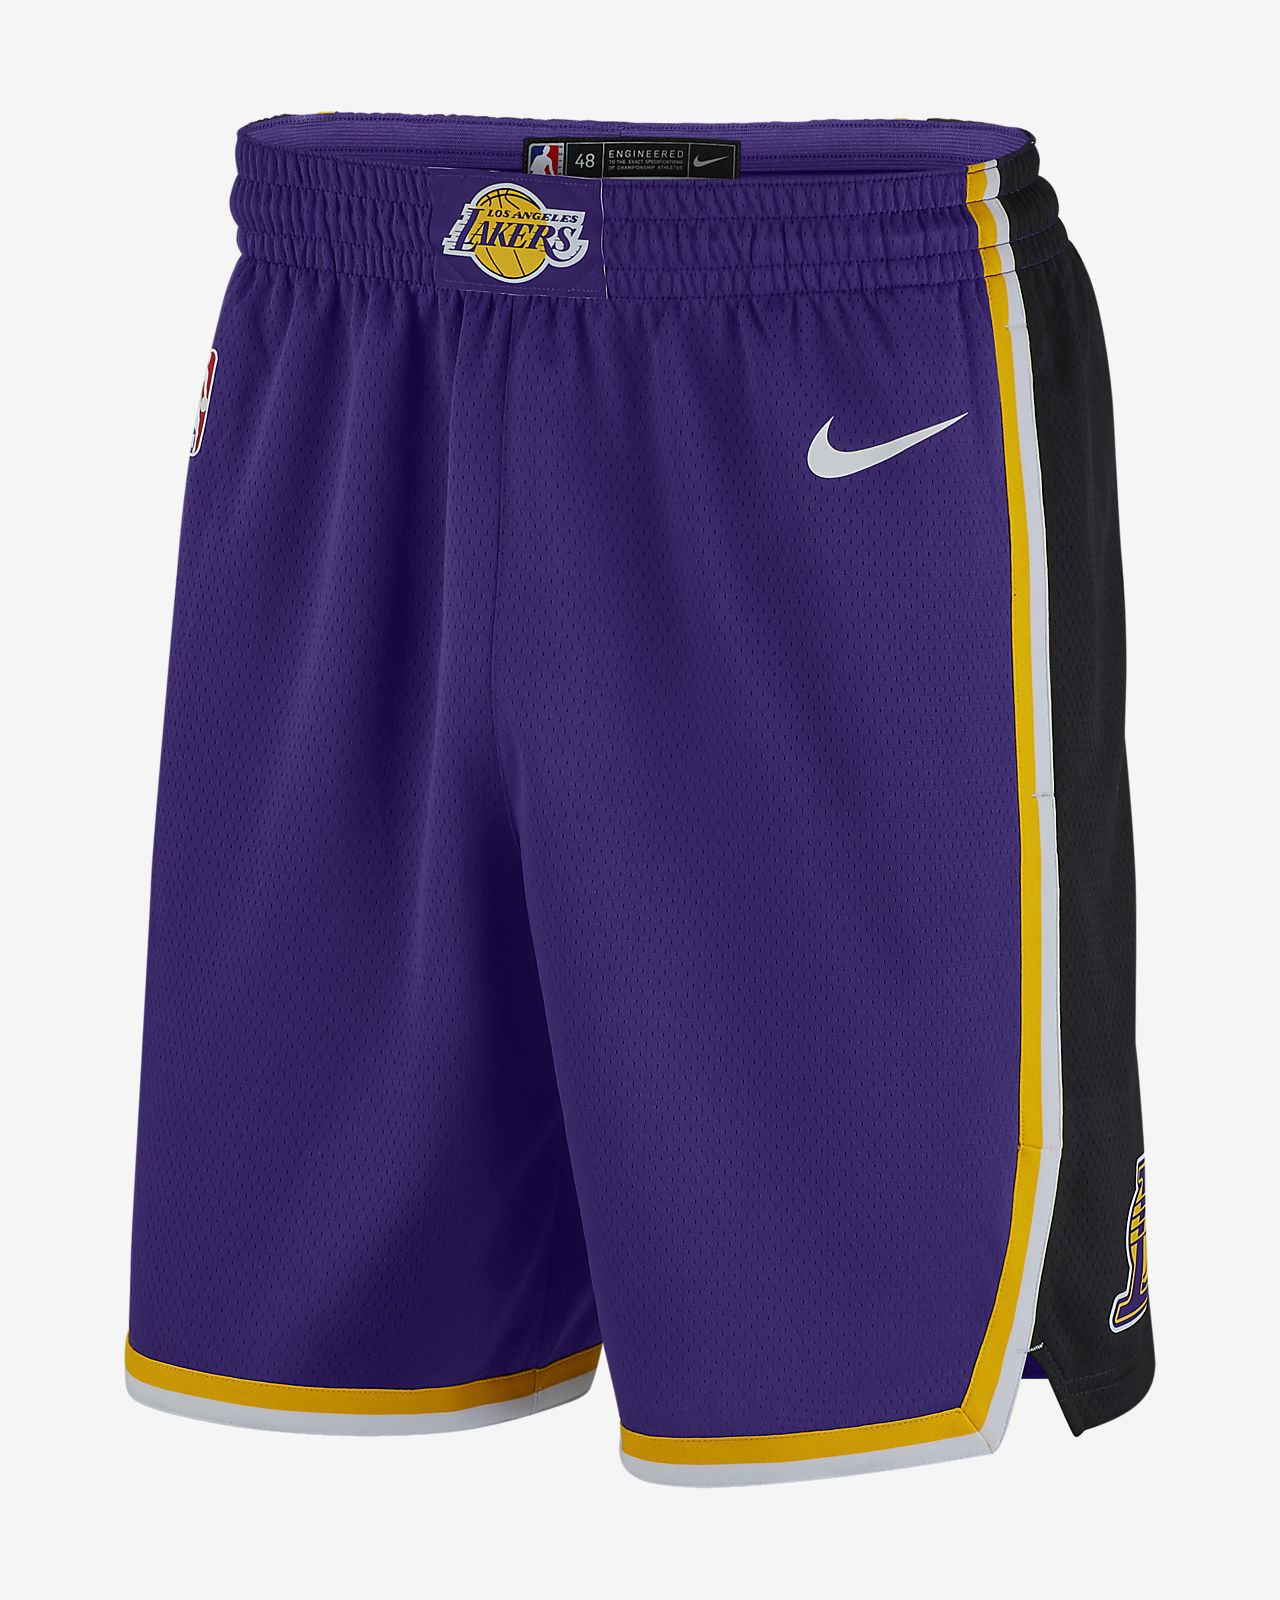 Swingman Pour Angeles Nike Edition Statement Short Homme Lakers Los Nba CoedrBx